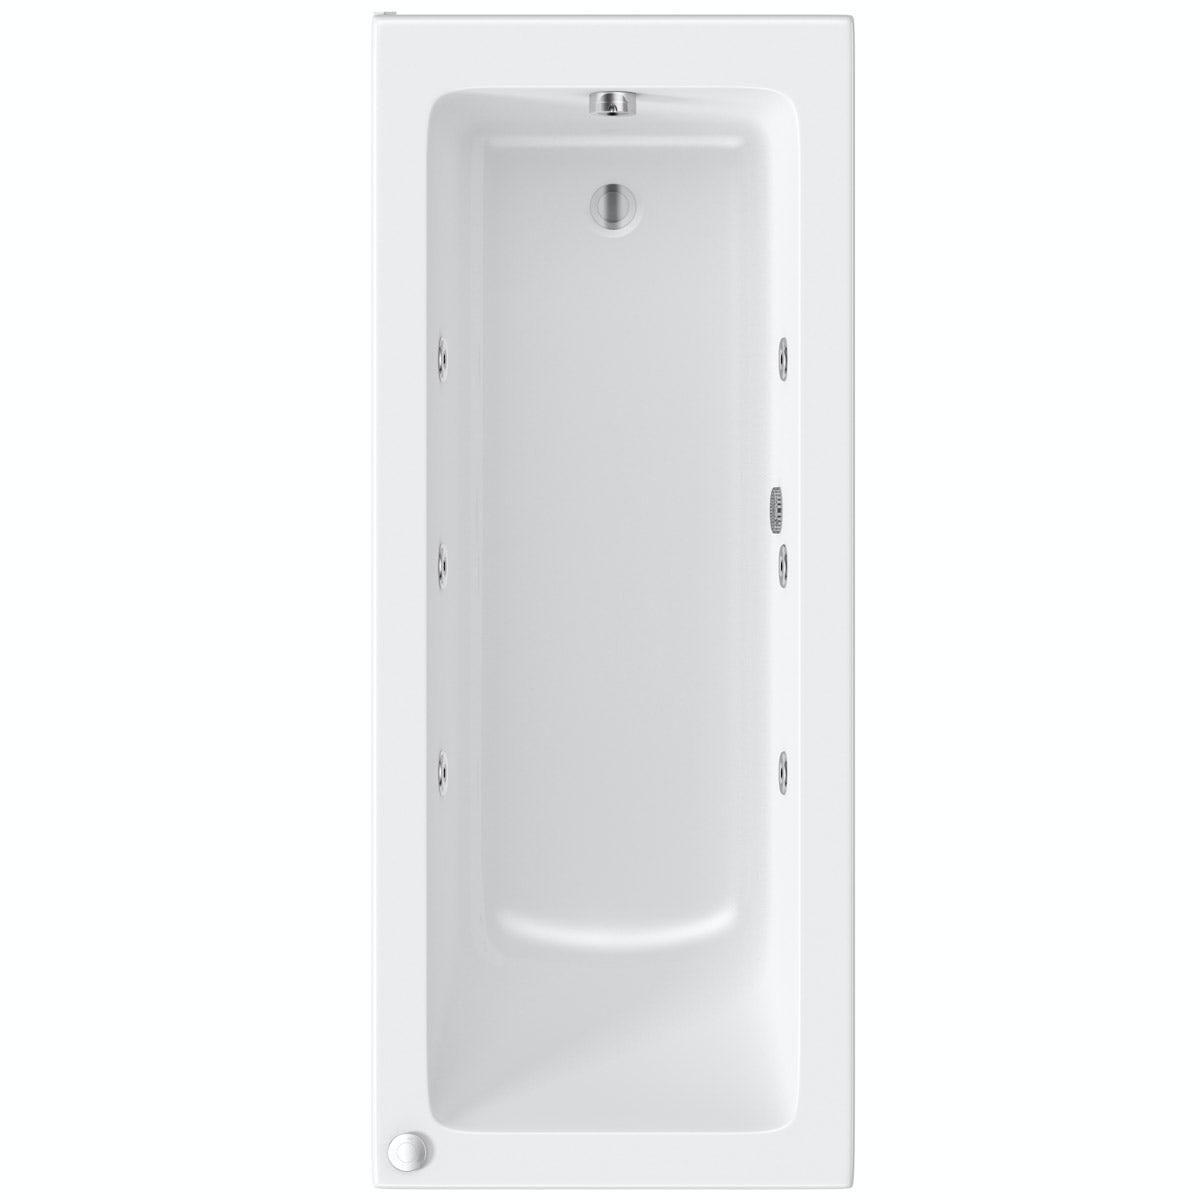 Mode Kensington single end 6 jet whirlpool bath 1700 x 700